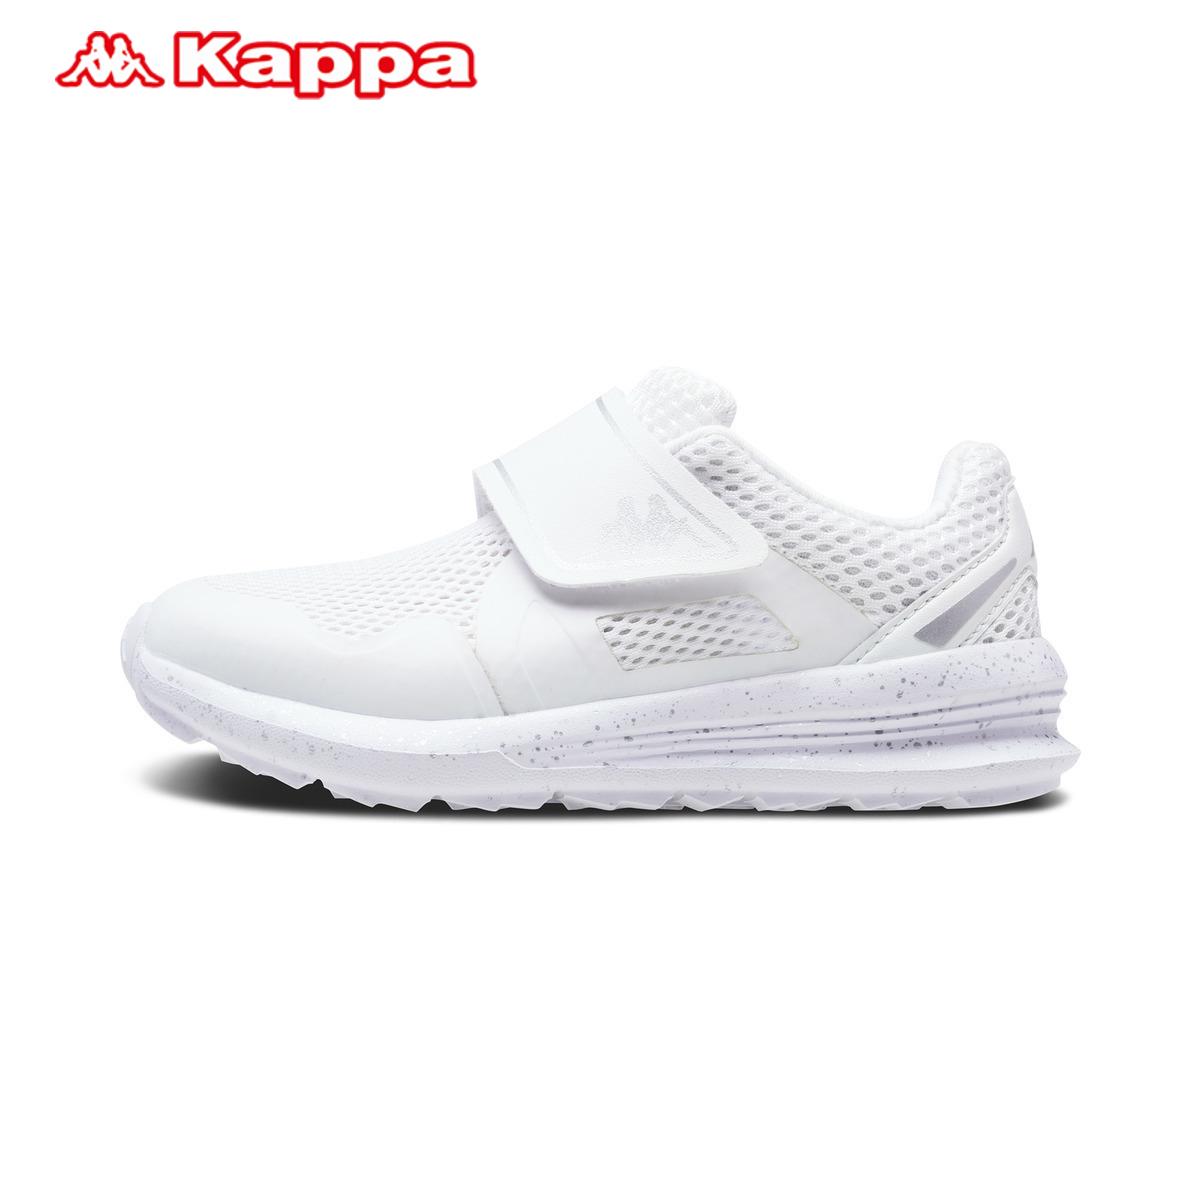 KappaKids卡帕童装KAPPA童装男女童休闲运动鞋背靠背轻质透气跑鞋